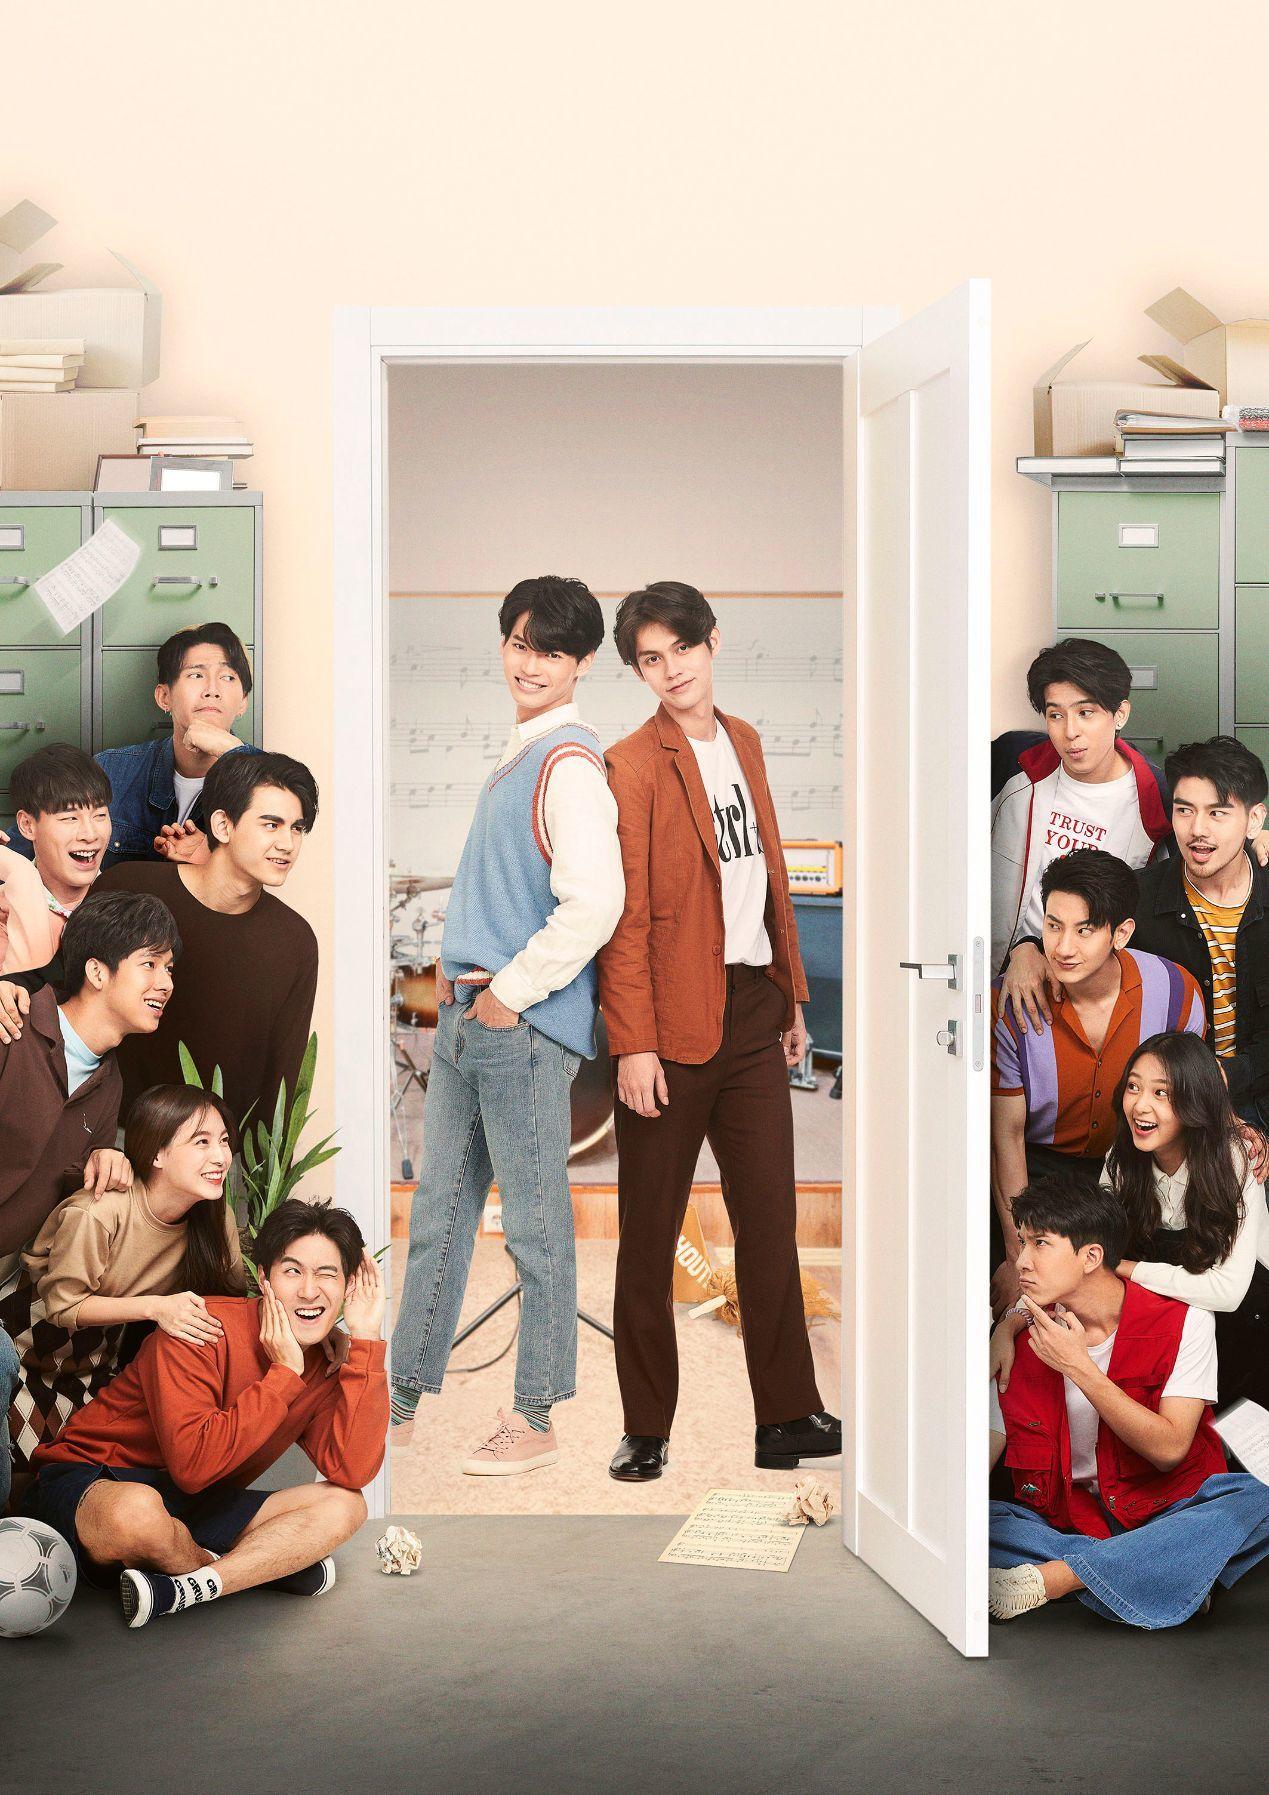 『Still 2gether』 (C)GMMTV Company Limited